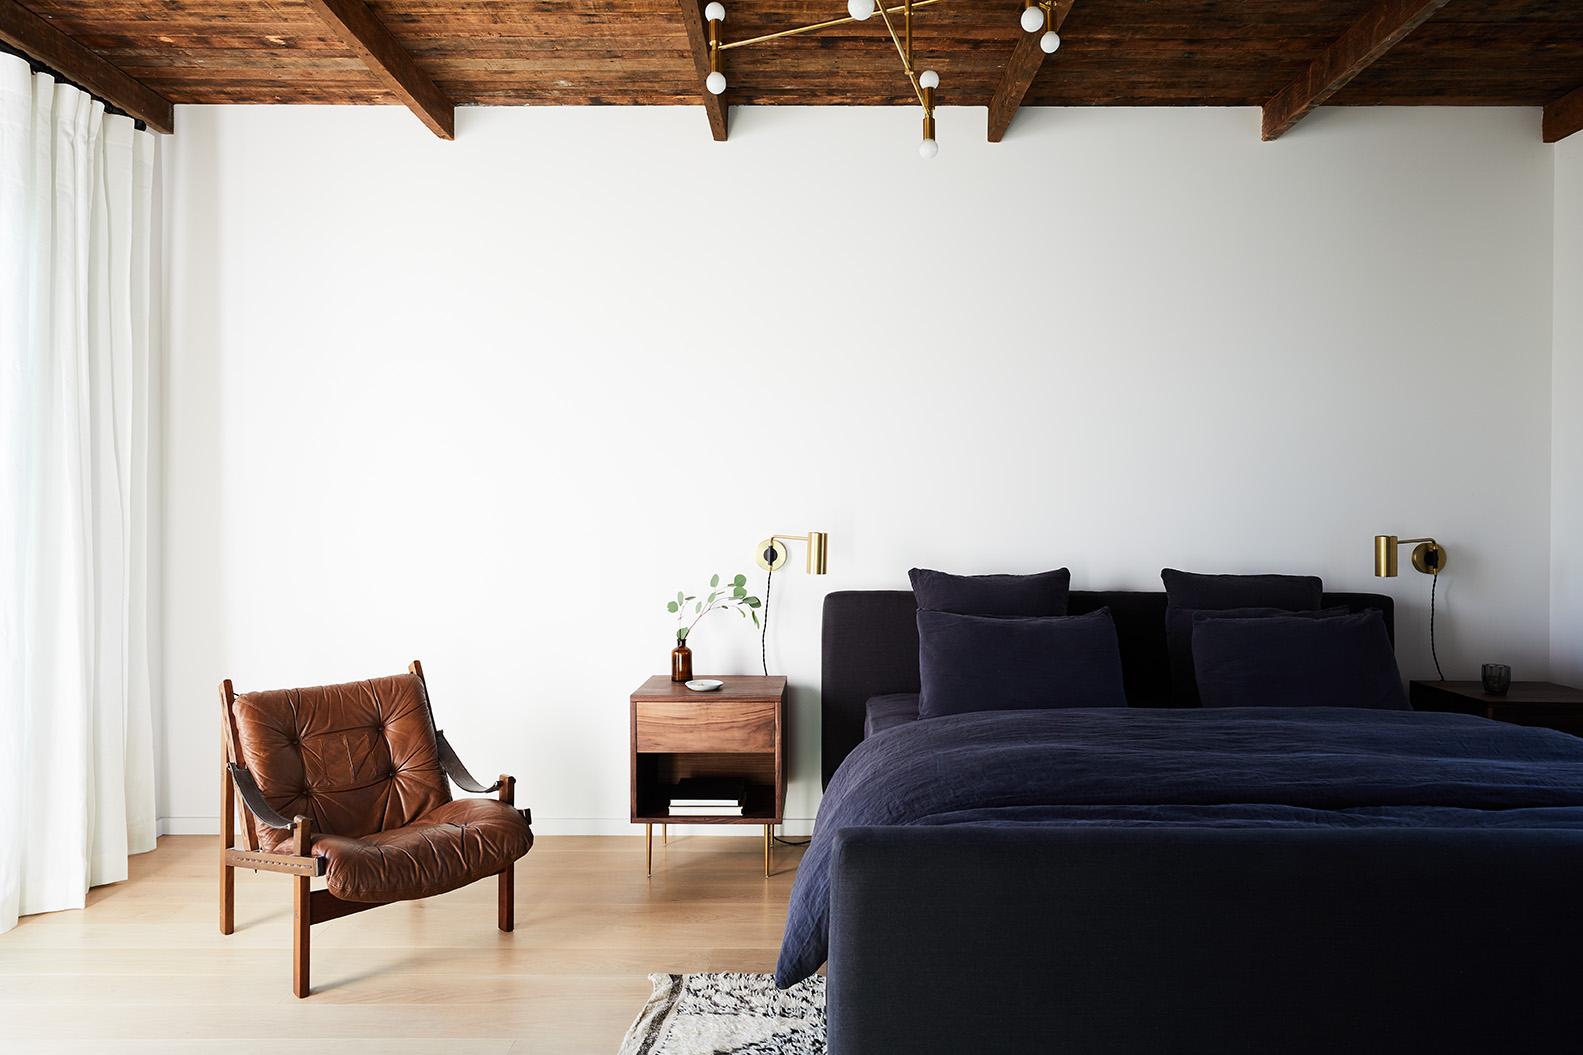 Jette_Rialto_Bedroom_Master_041.jpg